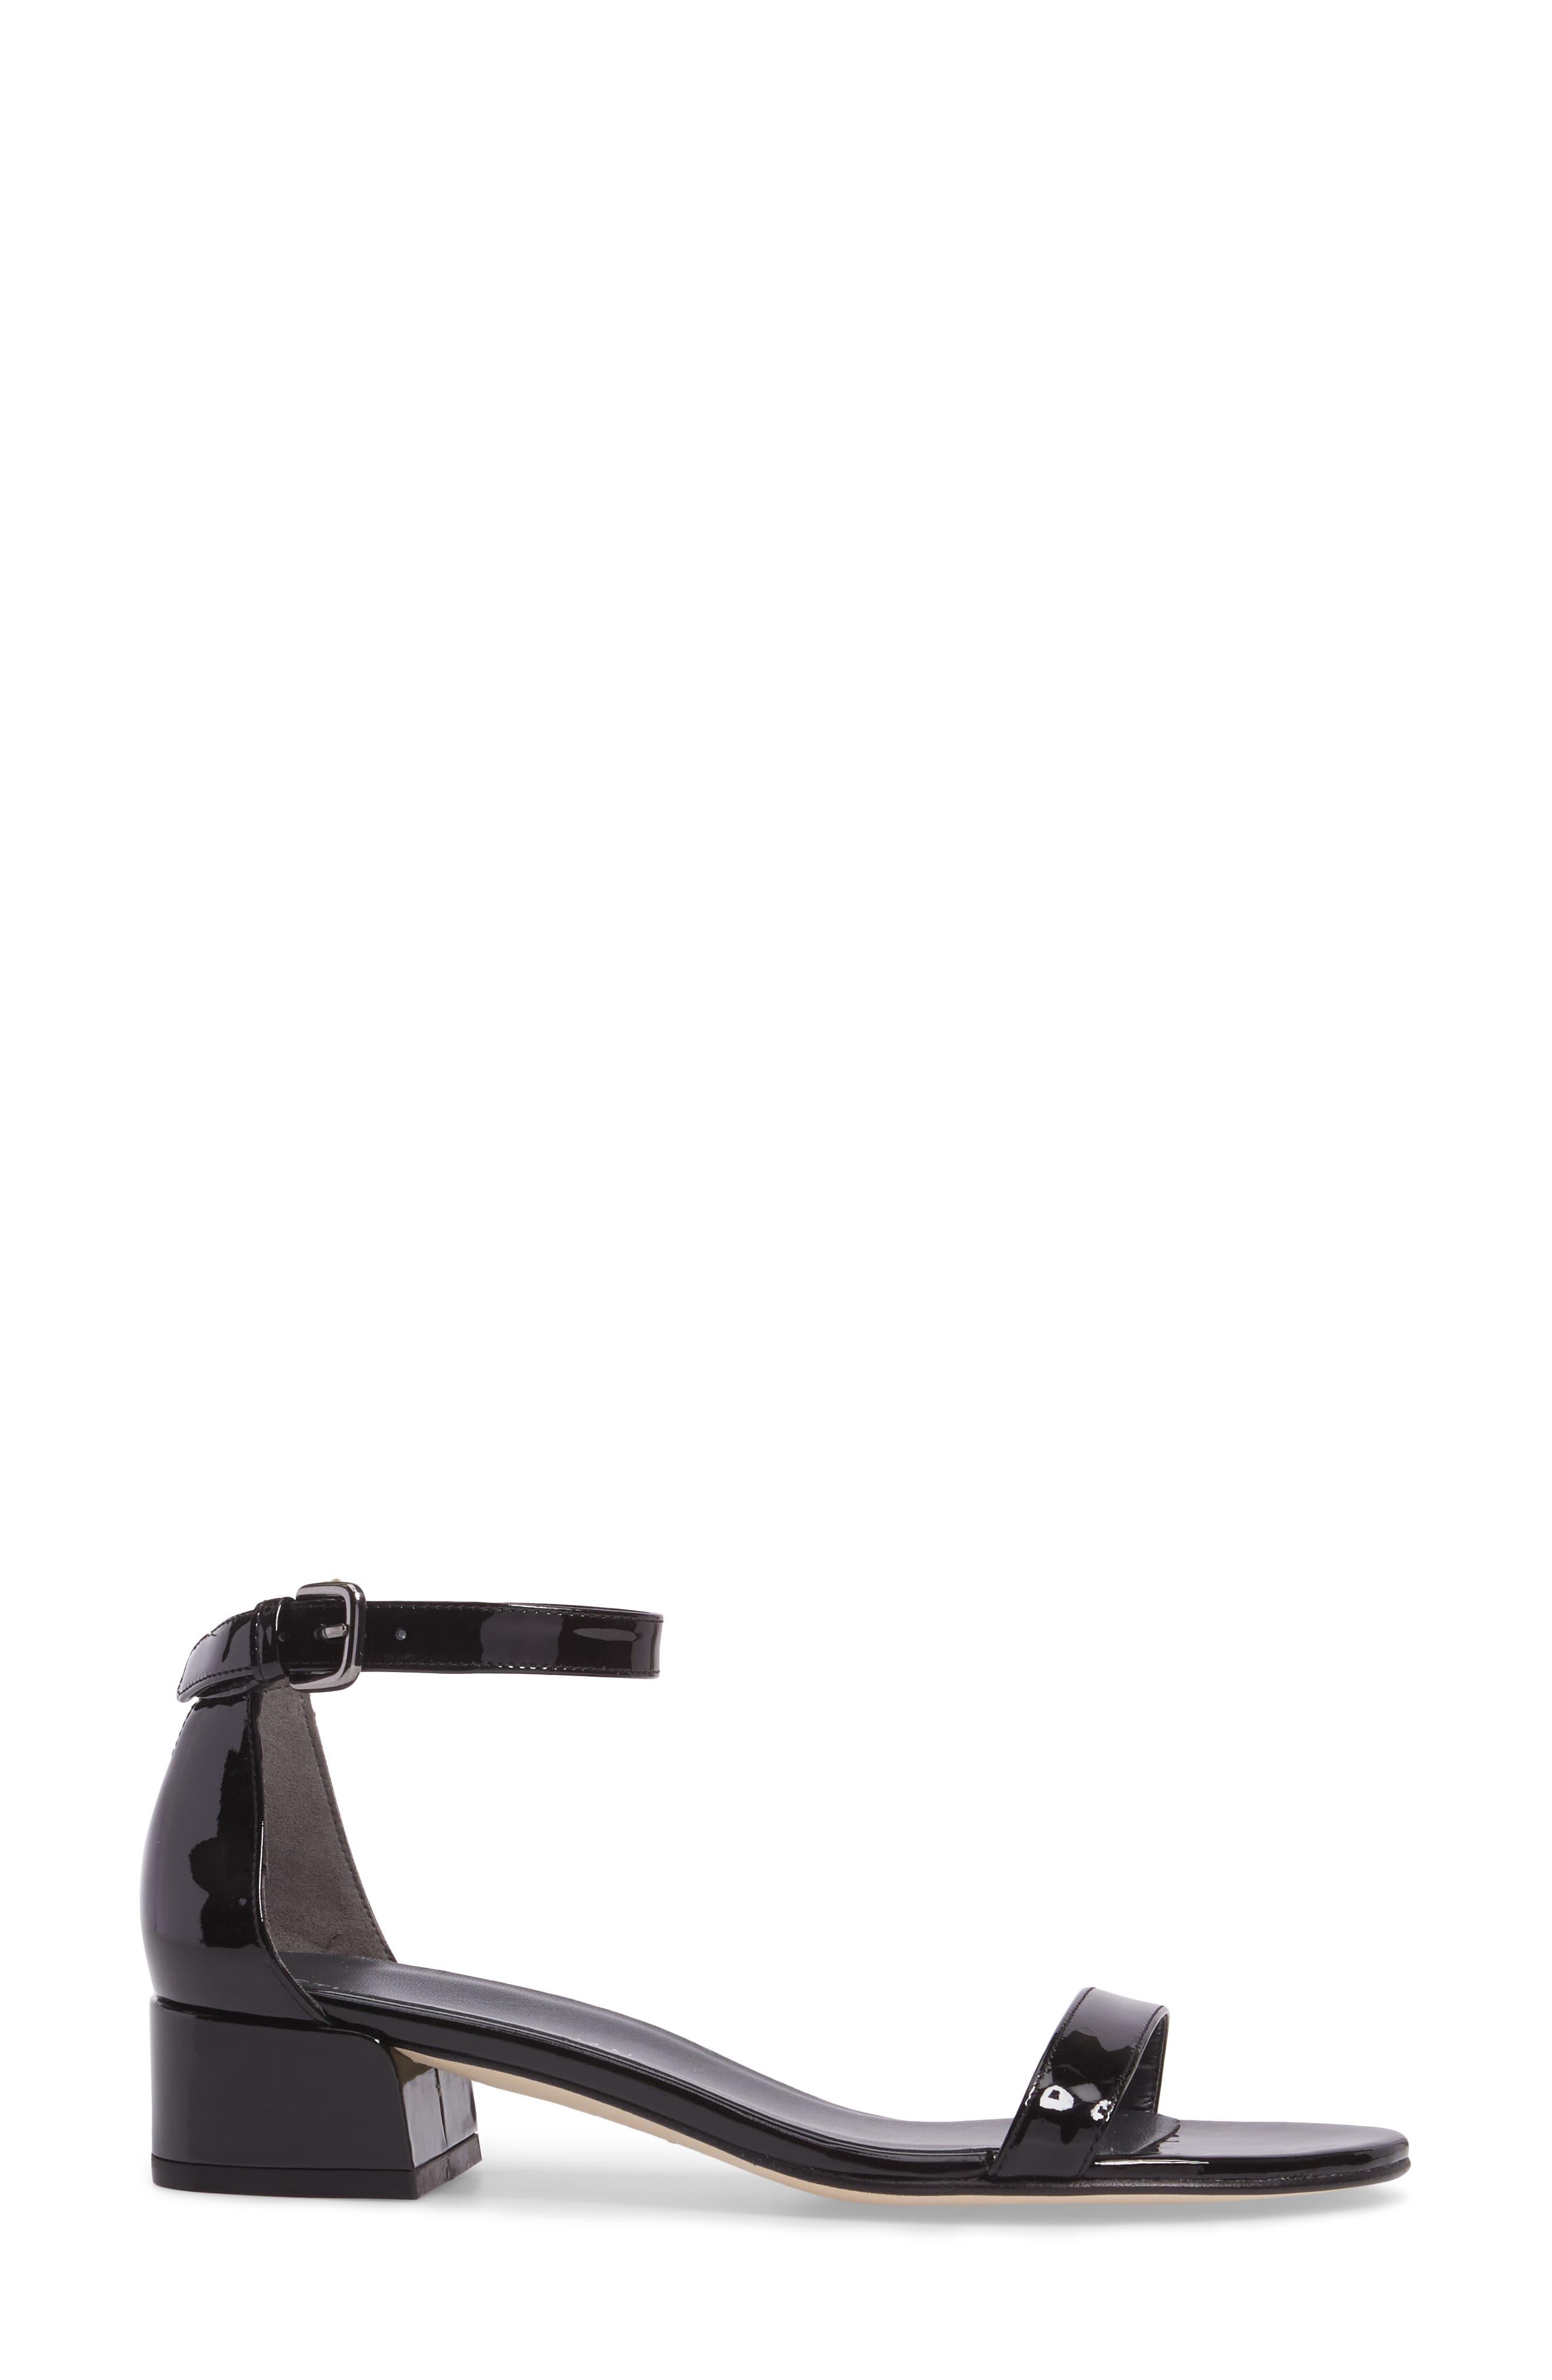 NudistJune Block Heel Sandal,                             Alternate thumbnail 3, color,                             Black Patent